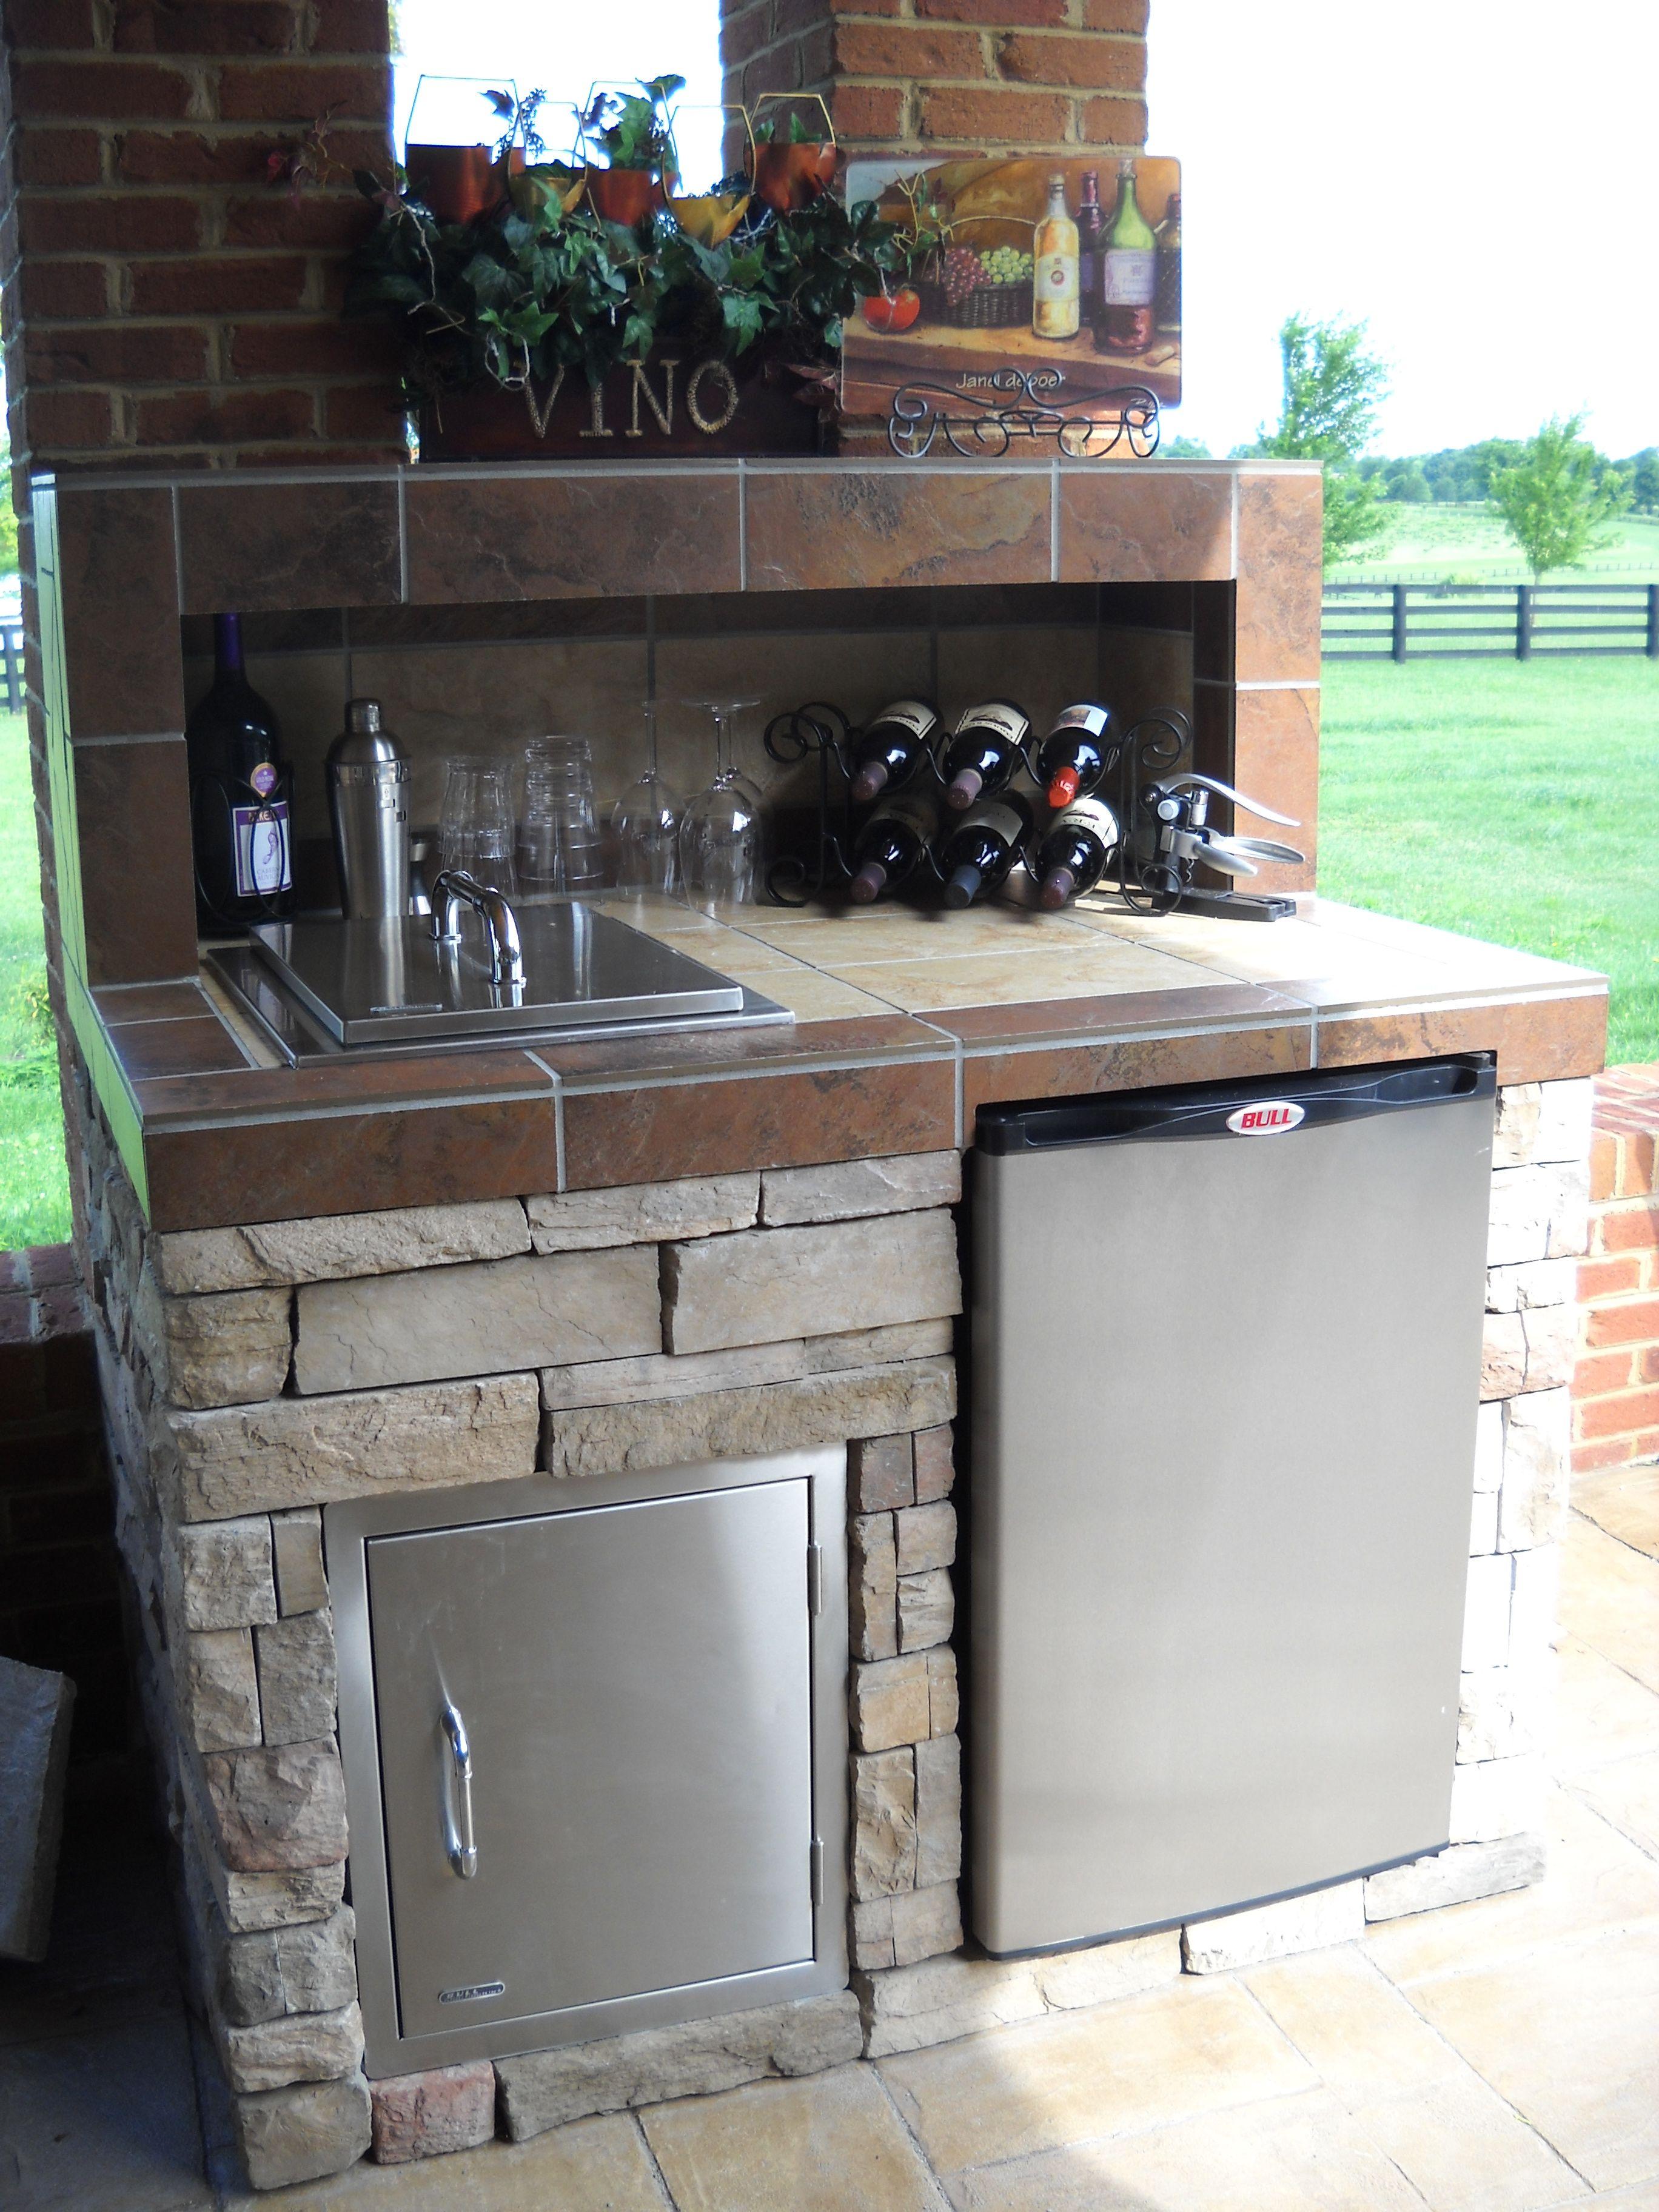 Pinleisure Depot On Outdoor Kitchens & Rooms  Pinterest Classy Outdoor Kitchen Home Depot Design Inspiration